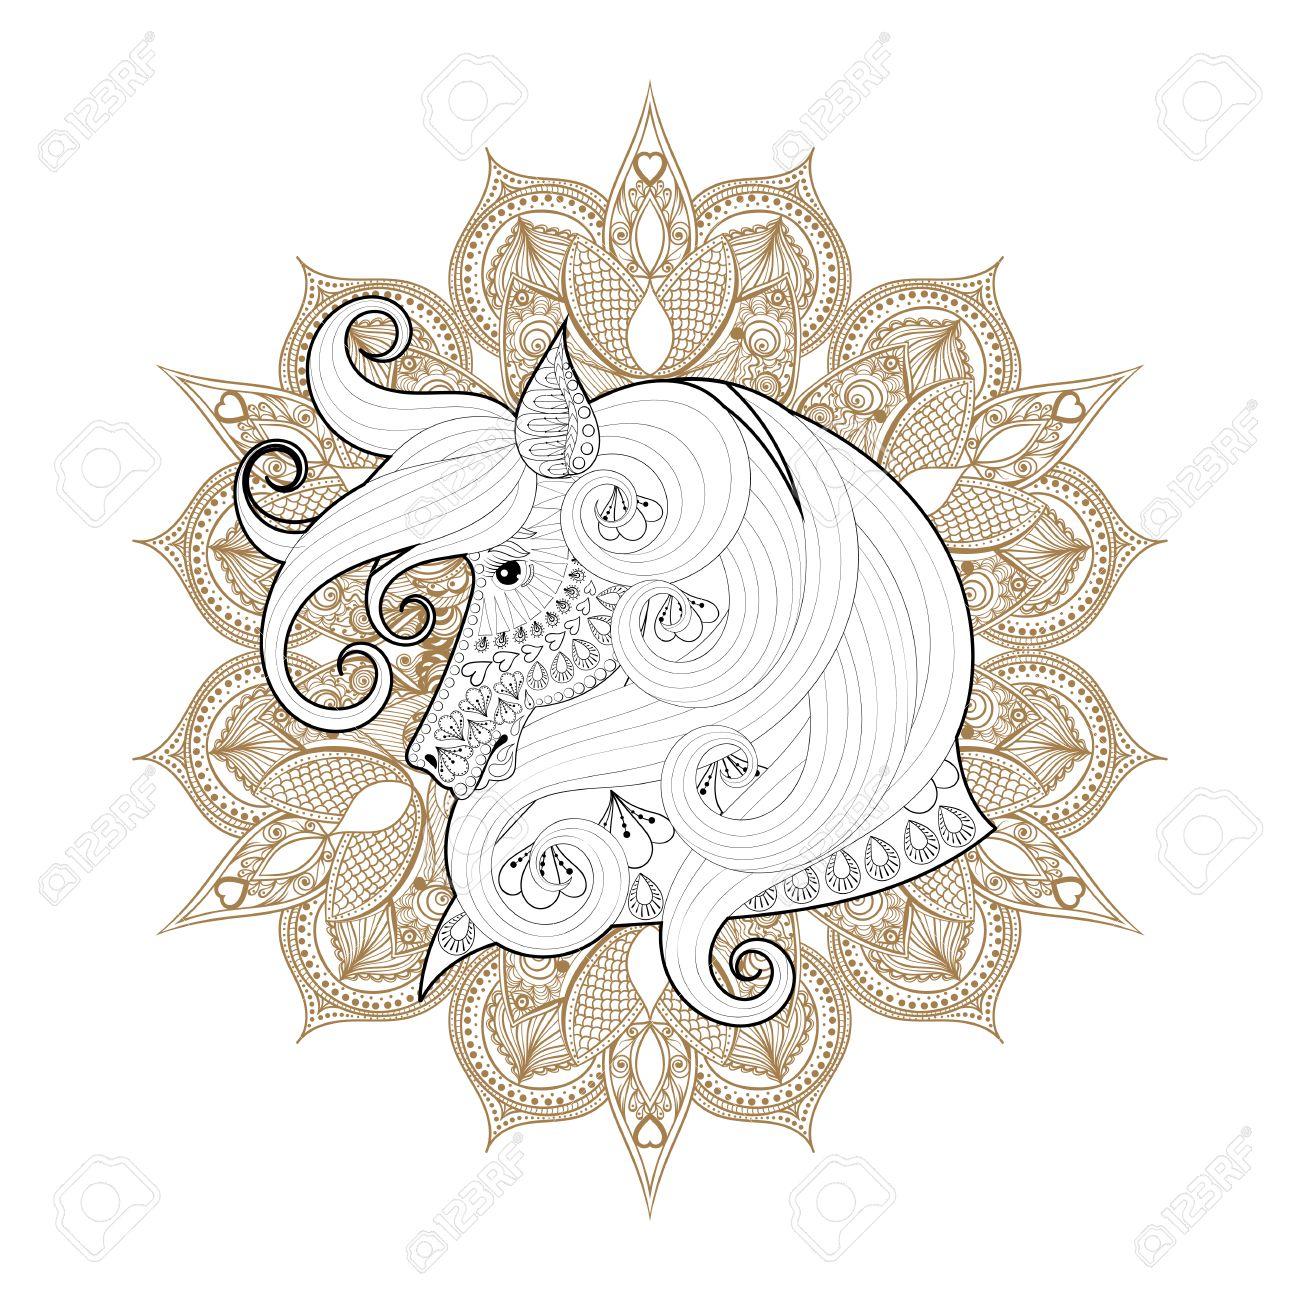 Dibujado A Mano Ornamental Caballo En Mandala Mehendi Para Colorear ...